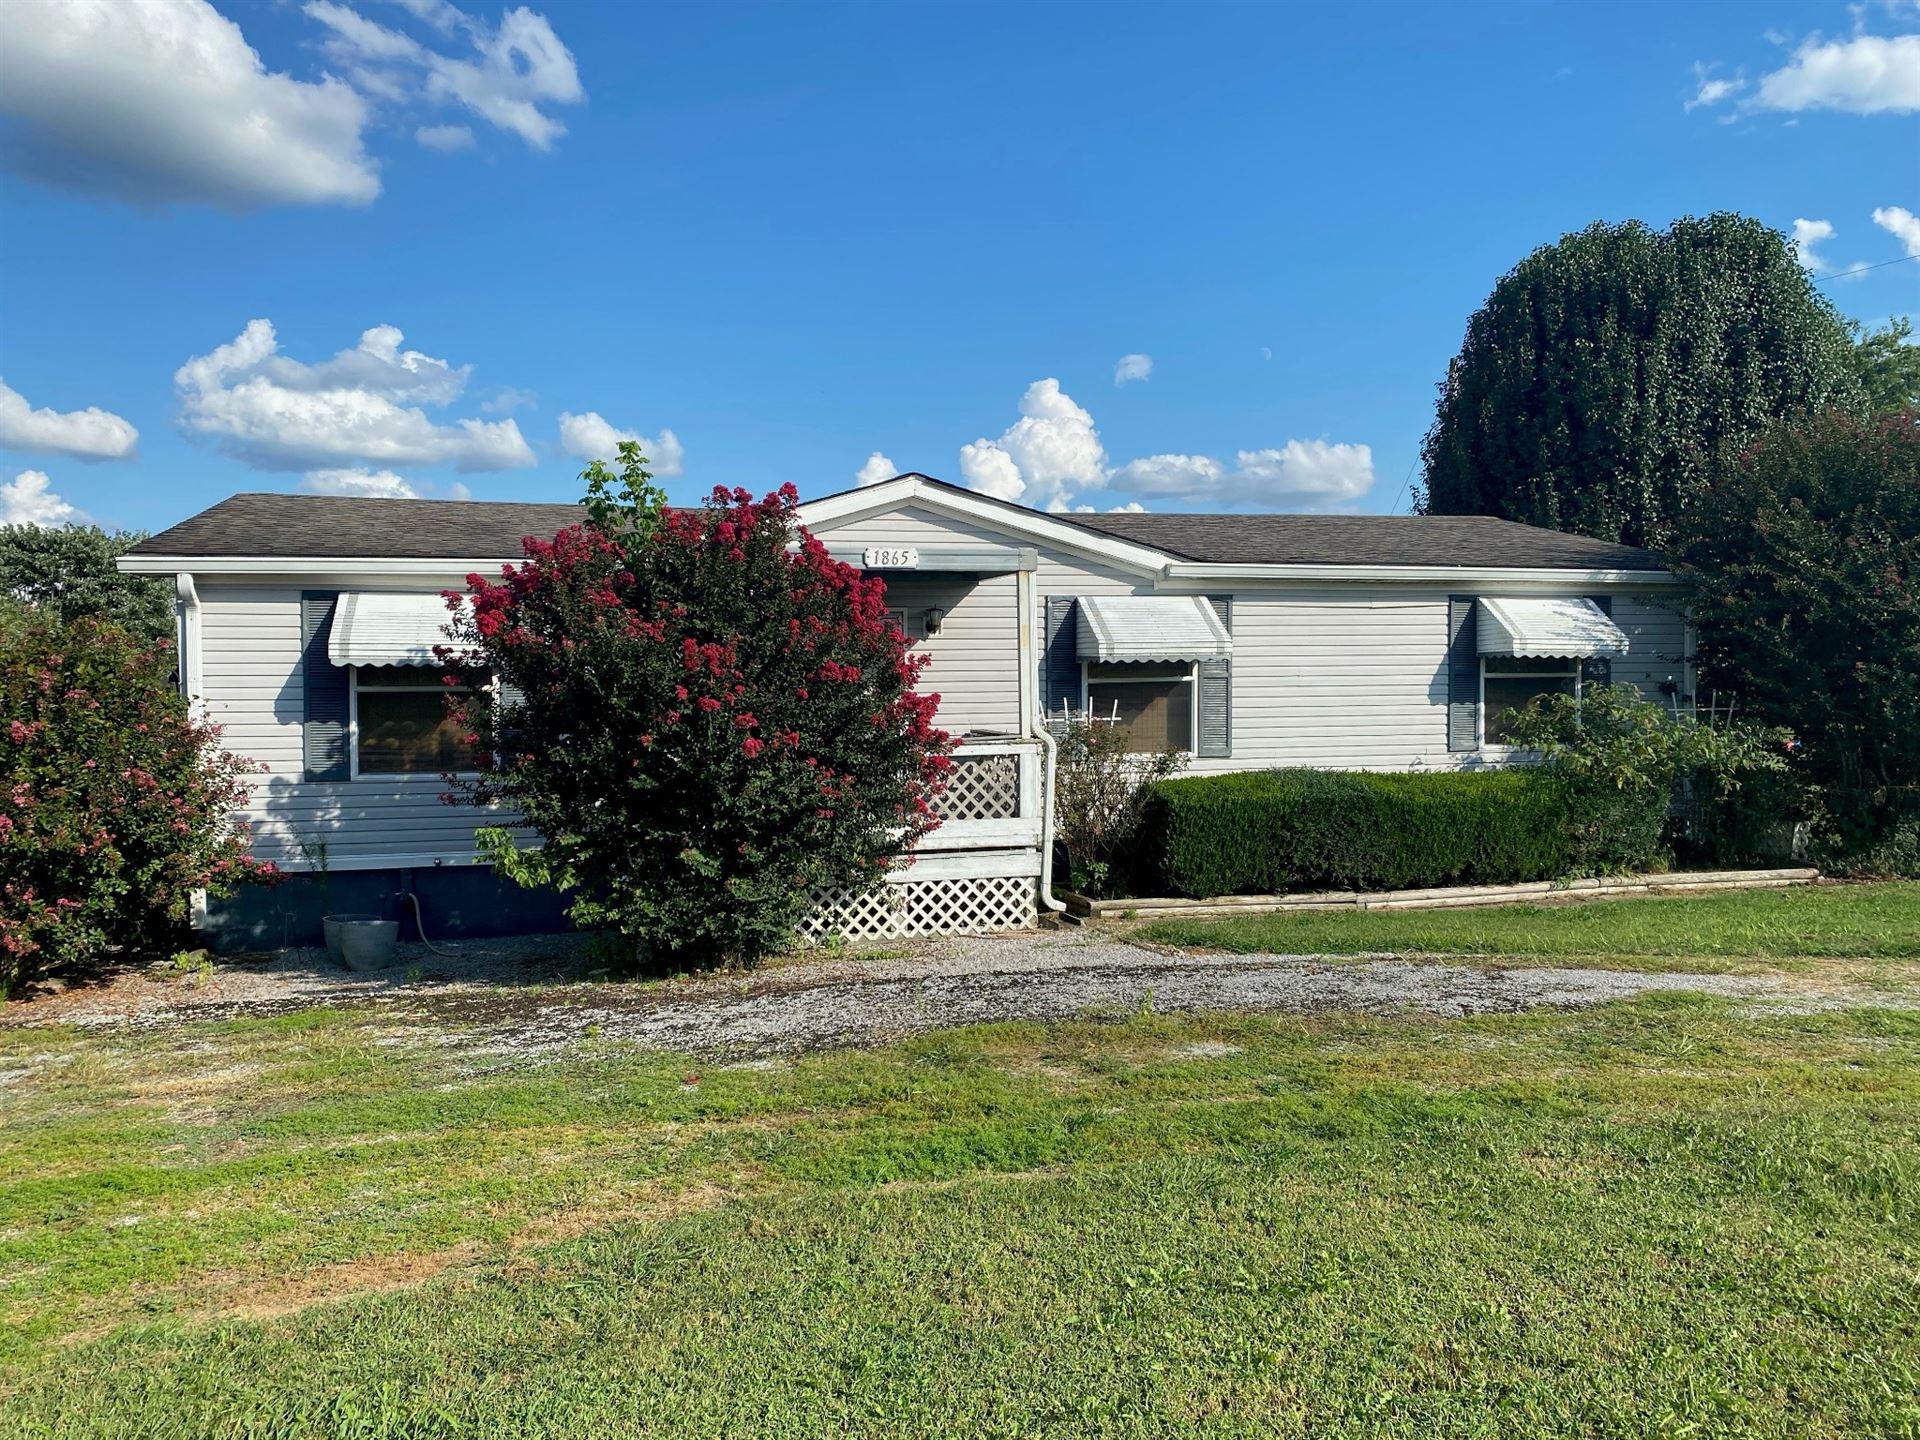 1865 S Commerce Rd, Watertown, TN 37184 - MLS#: 2291621